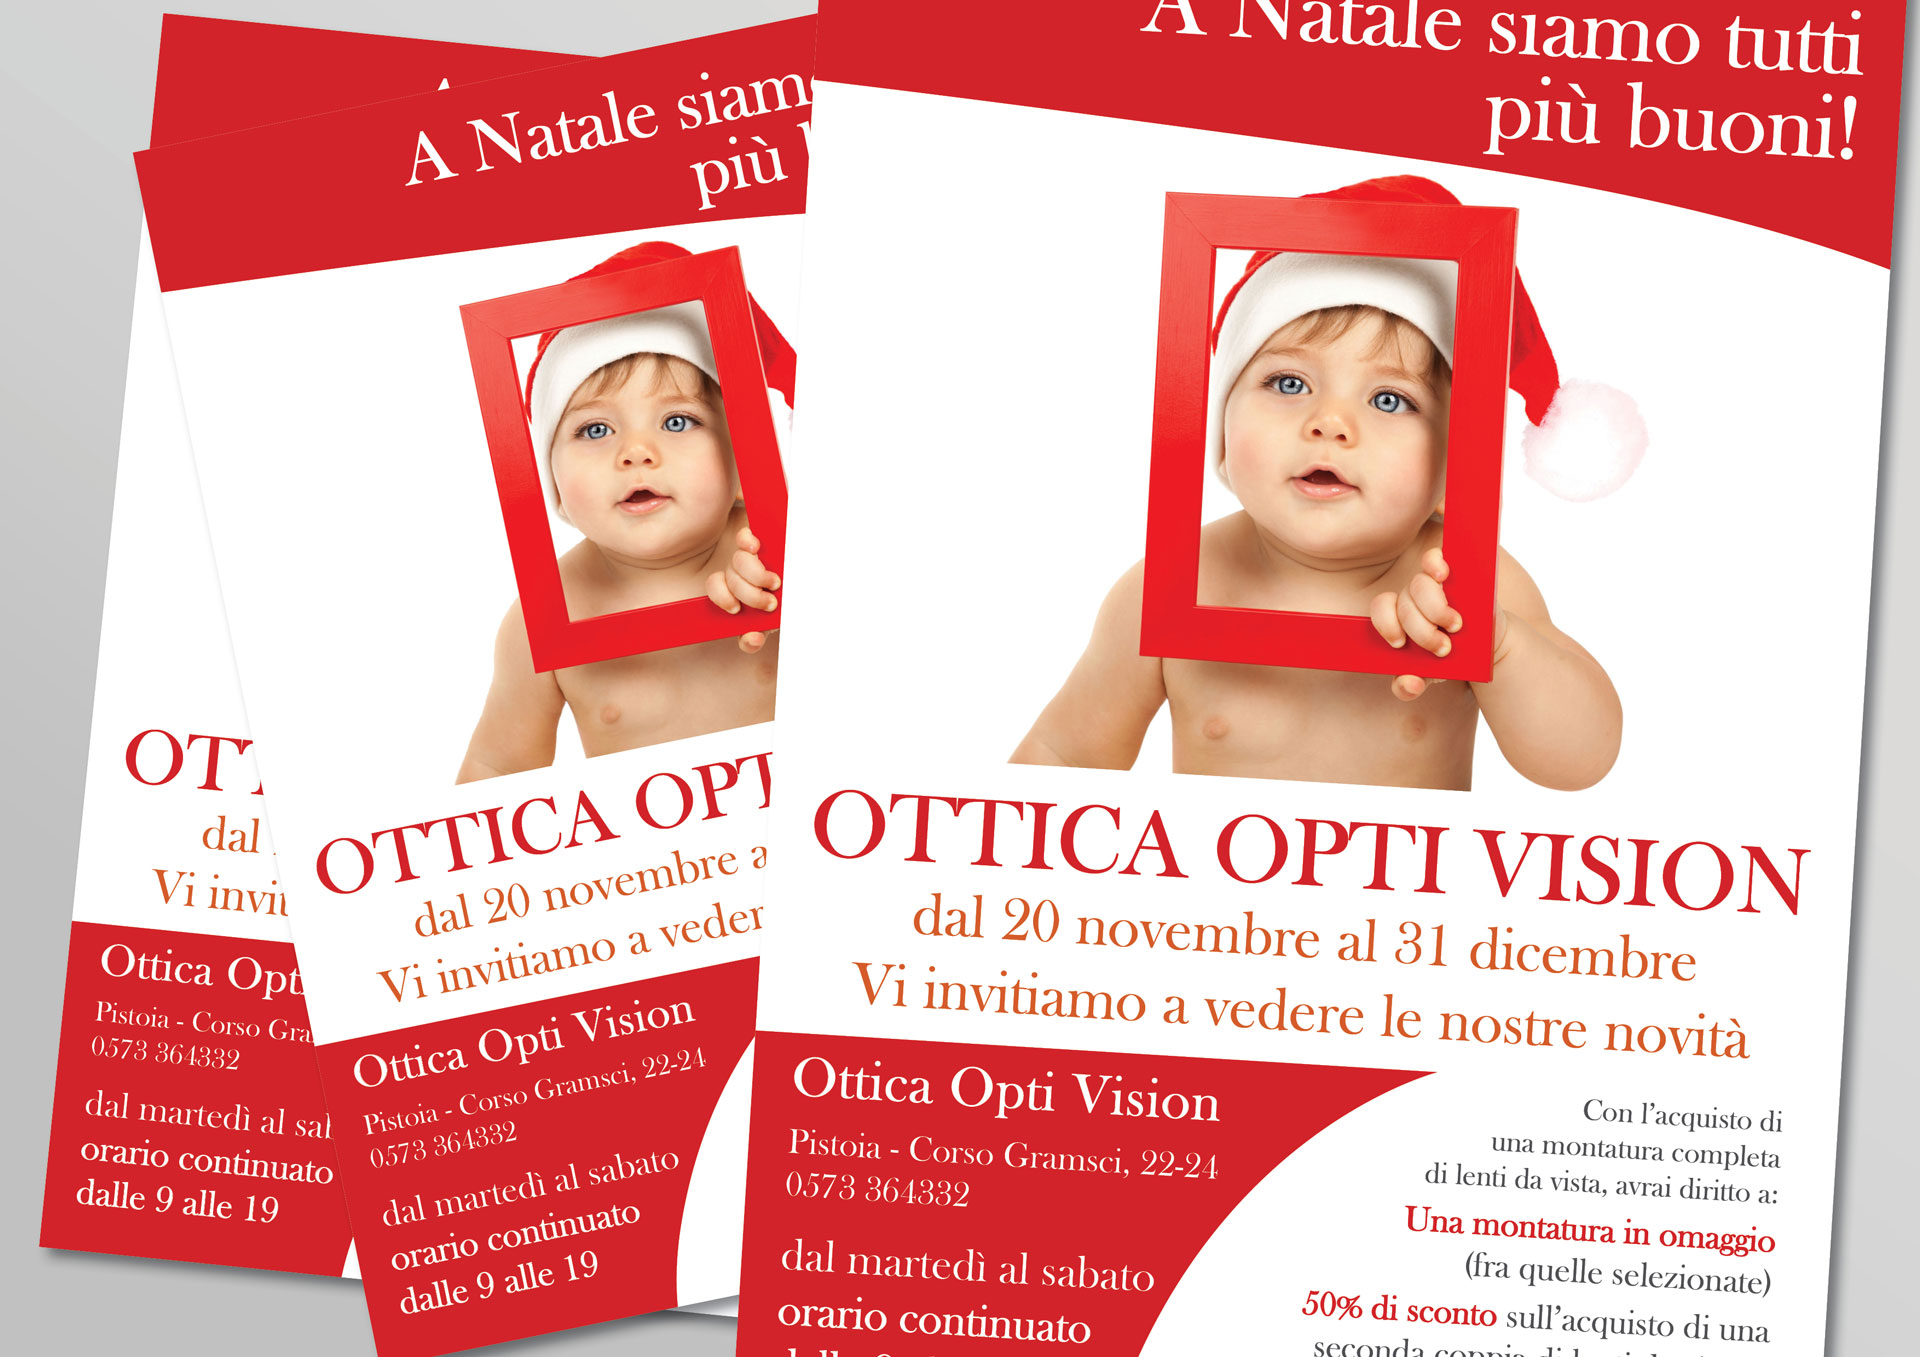 Ottica Opti Vision